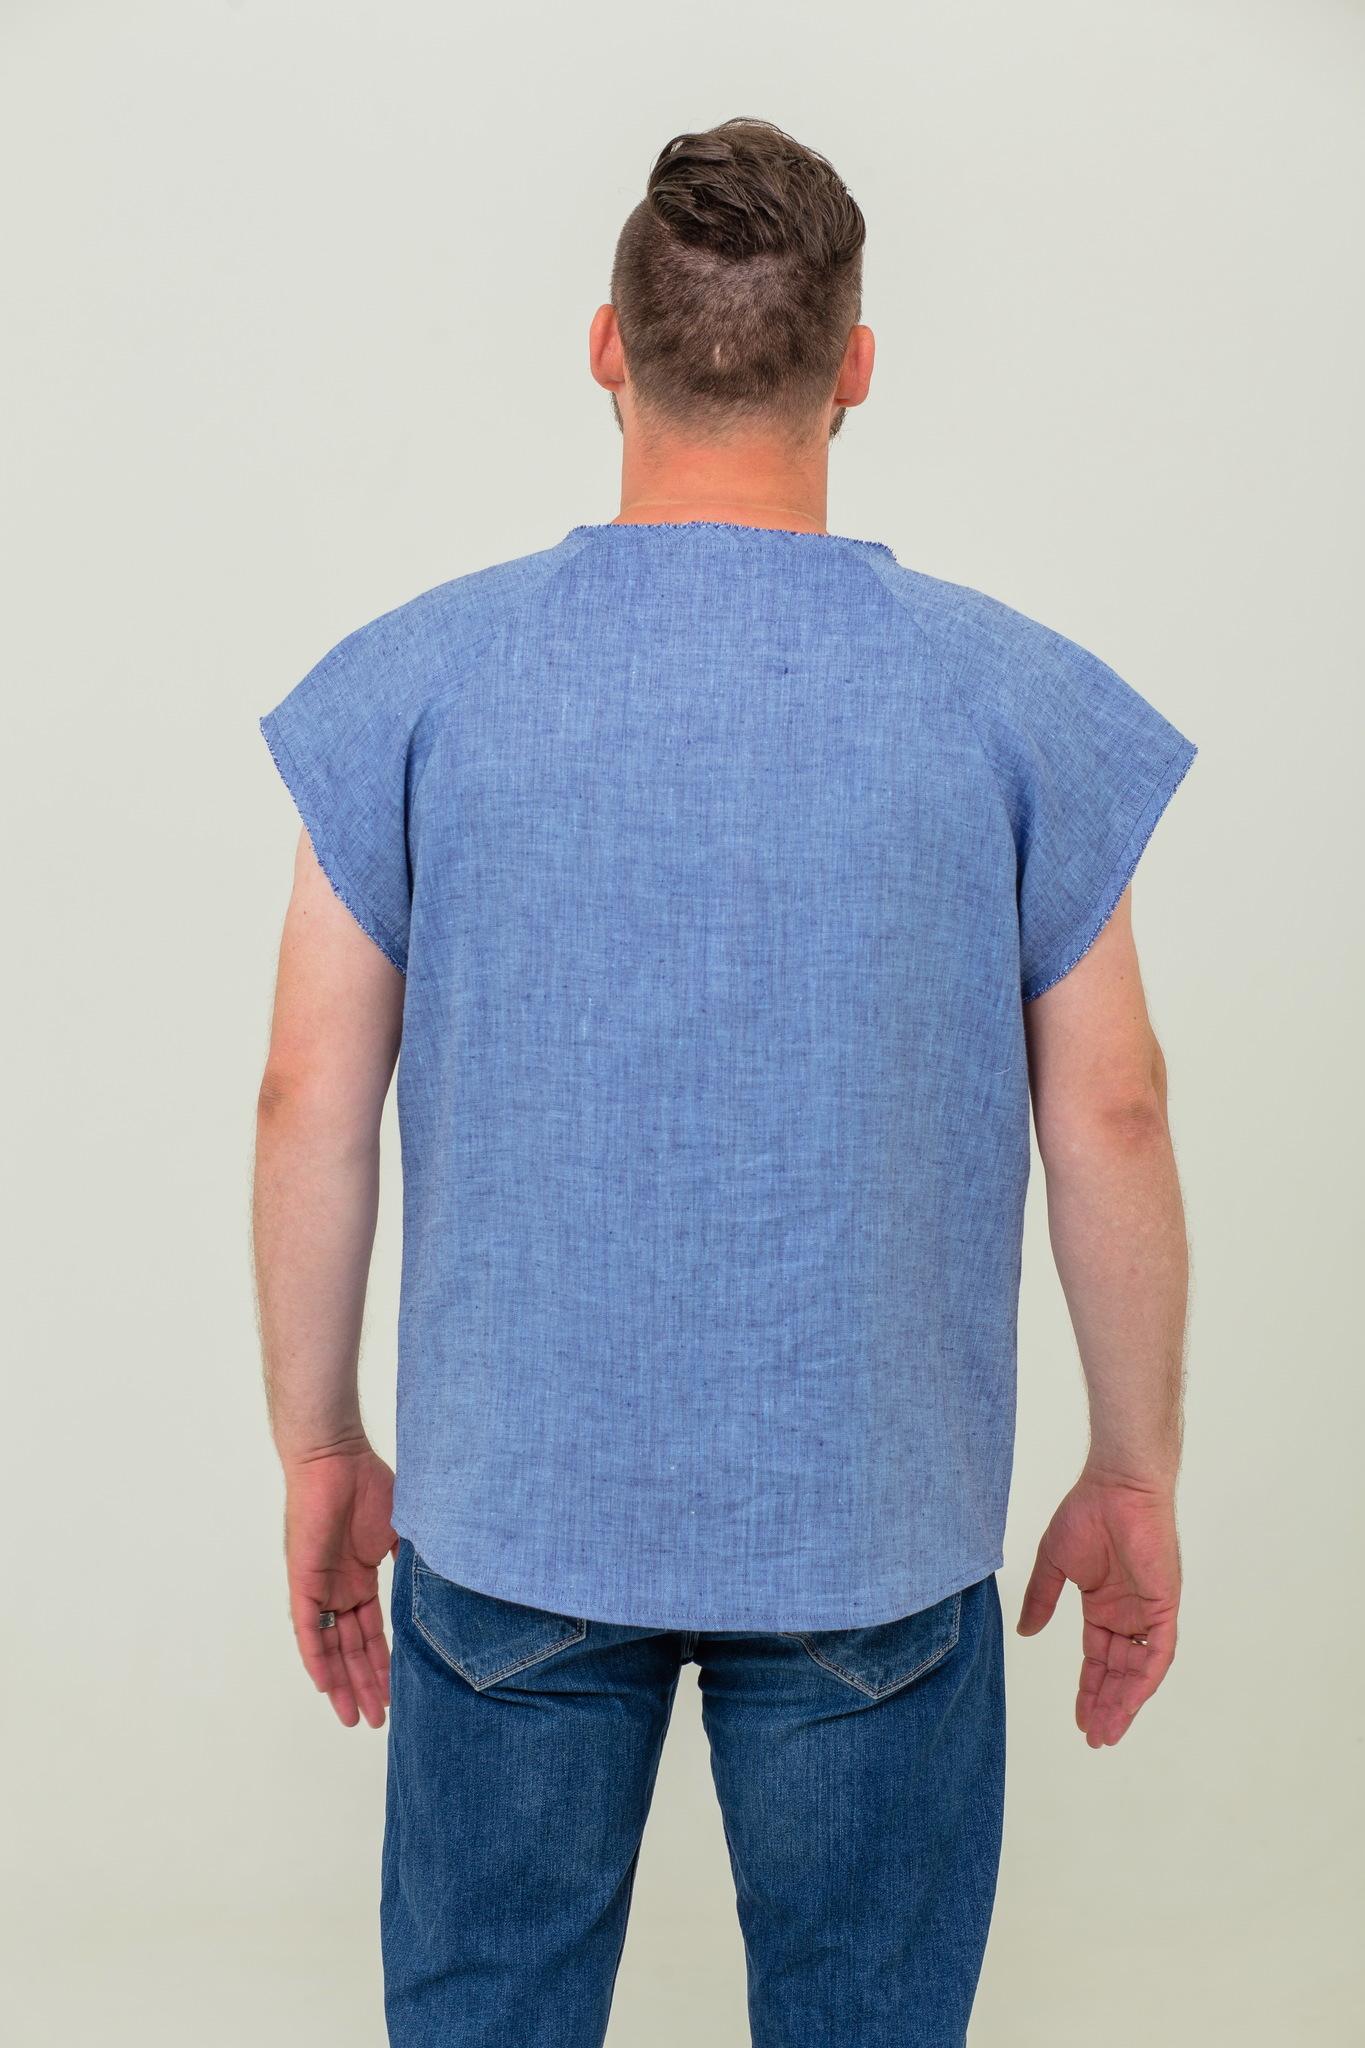 Льняная рубашка футболка славянская Богатырская